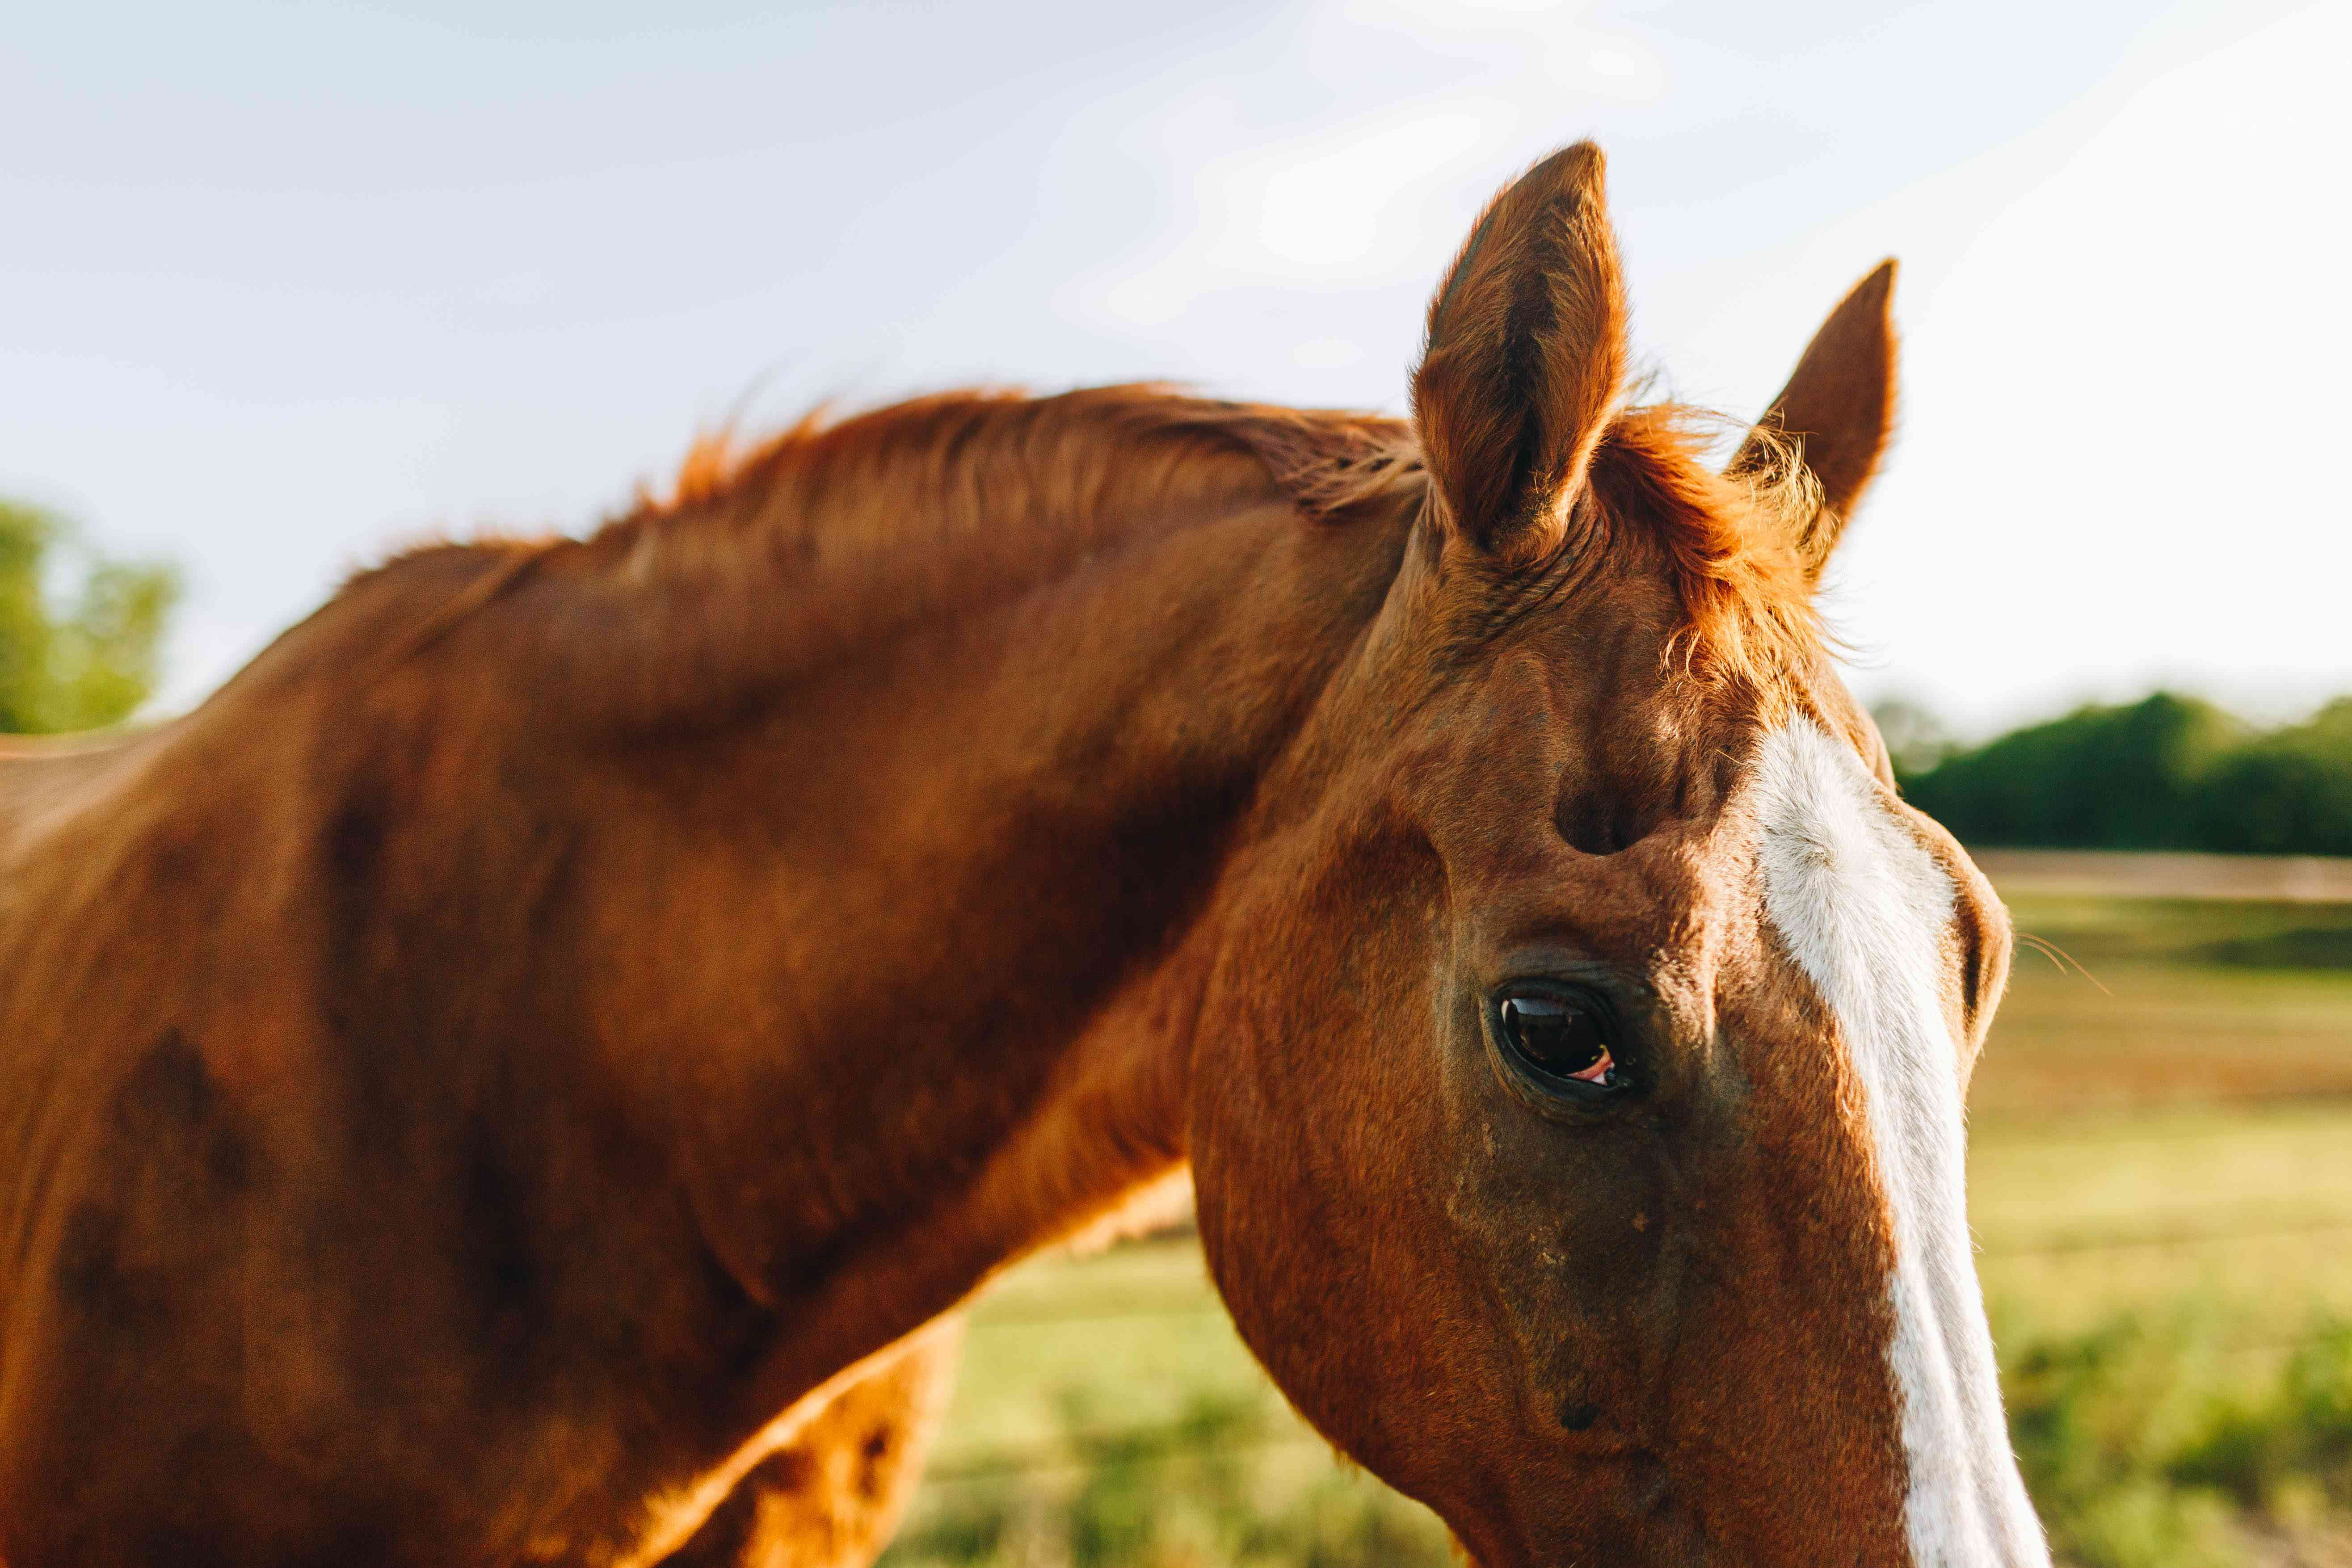 profile shot of brown horse making eye contact